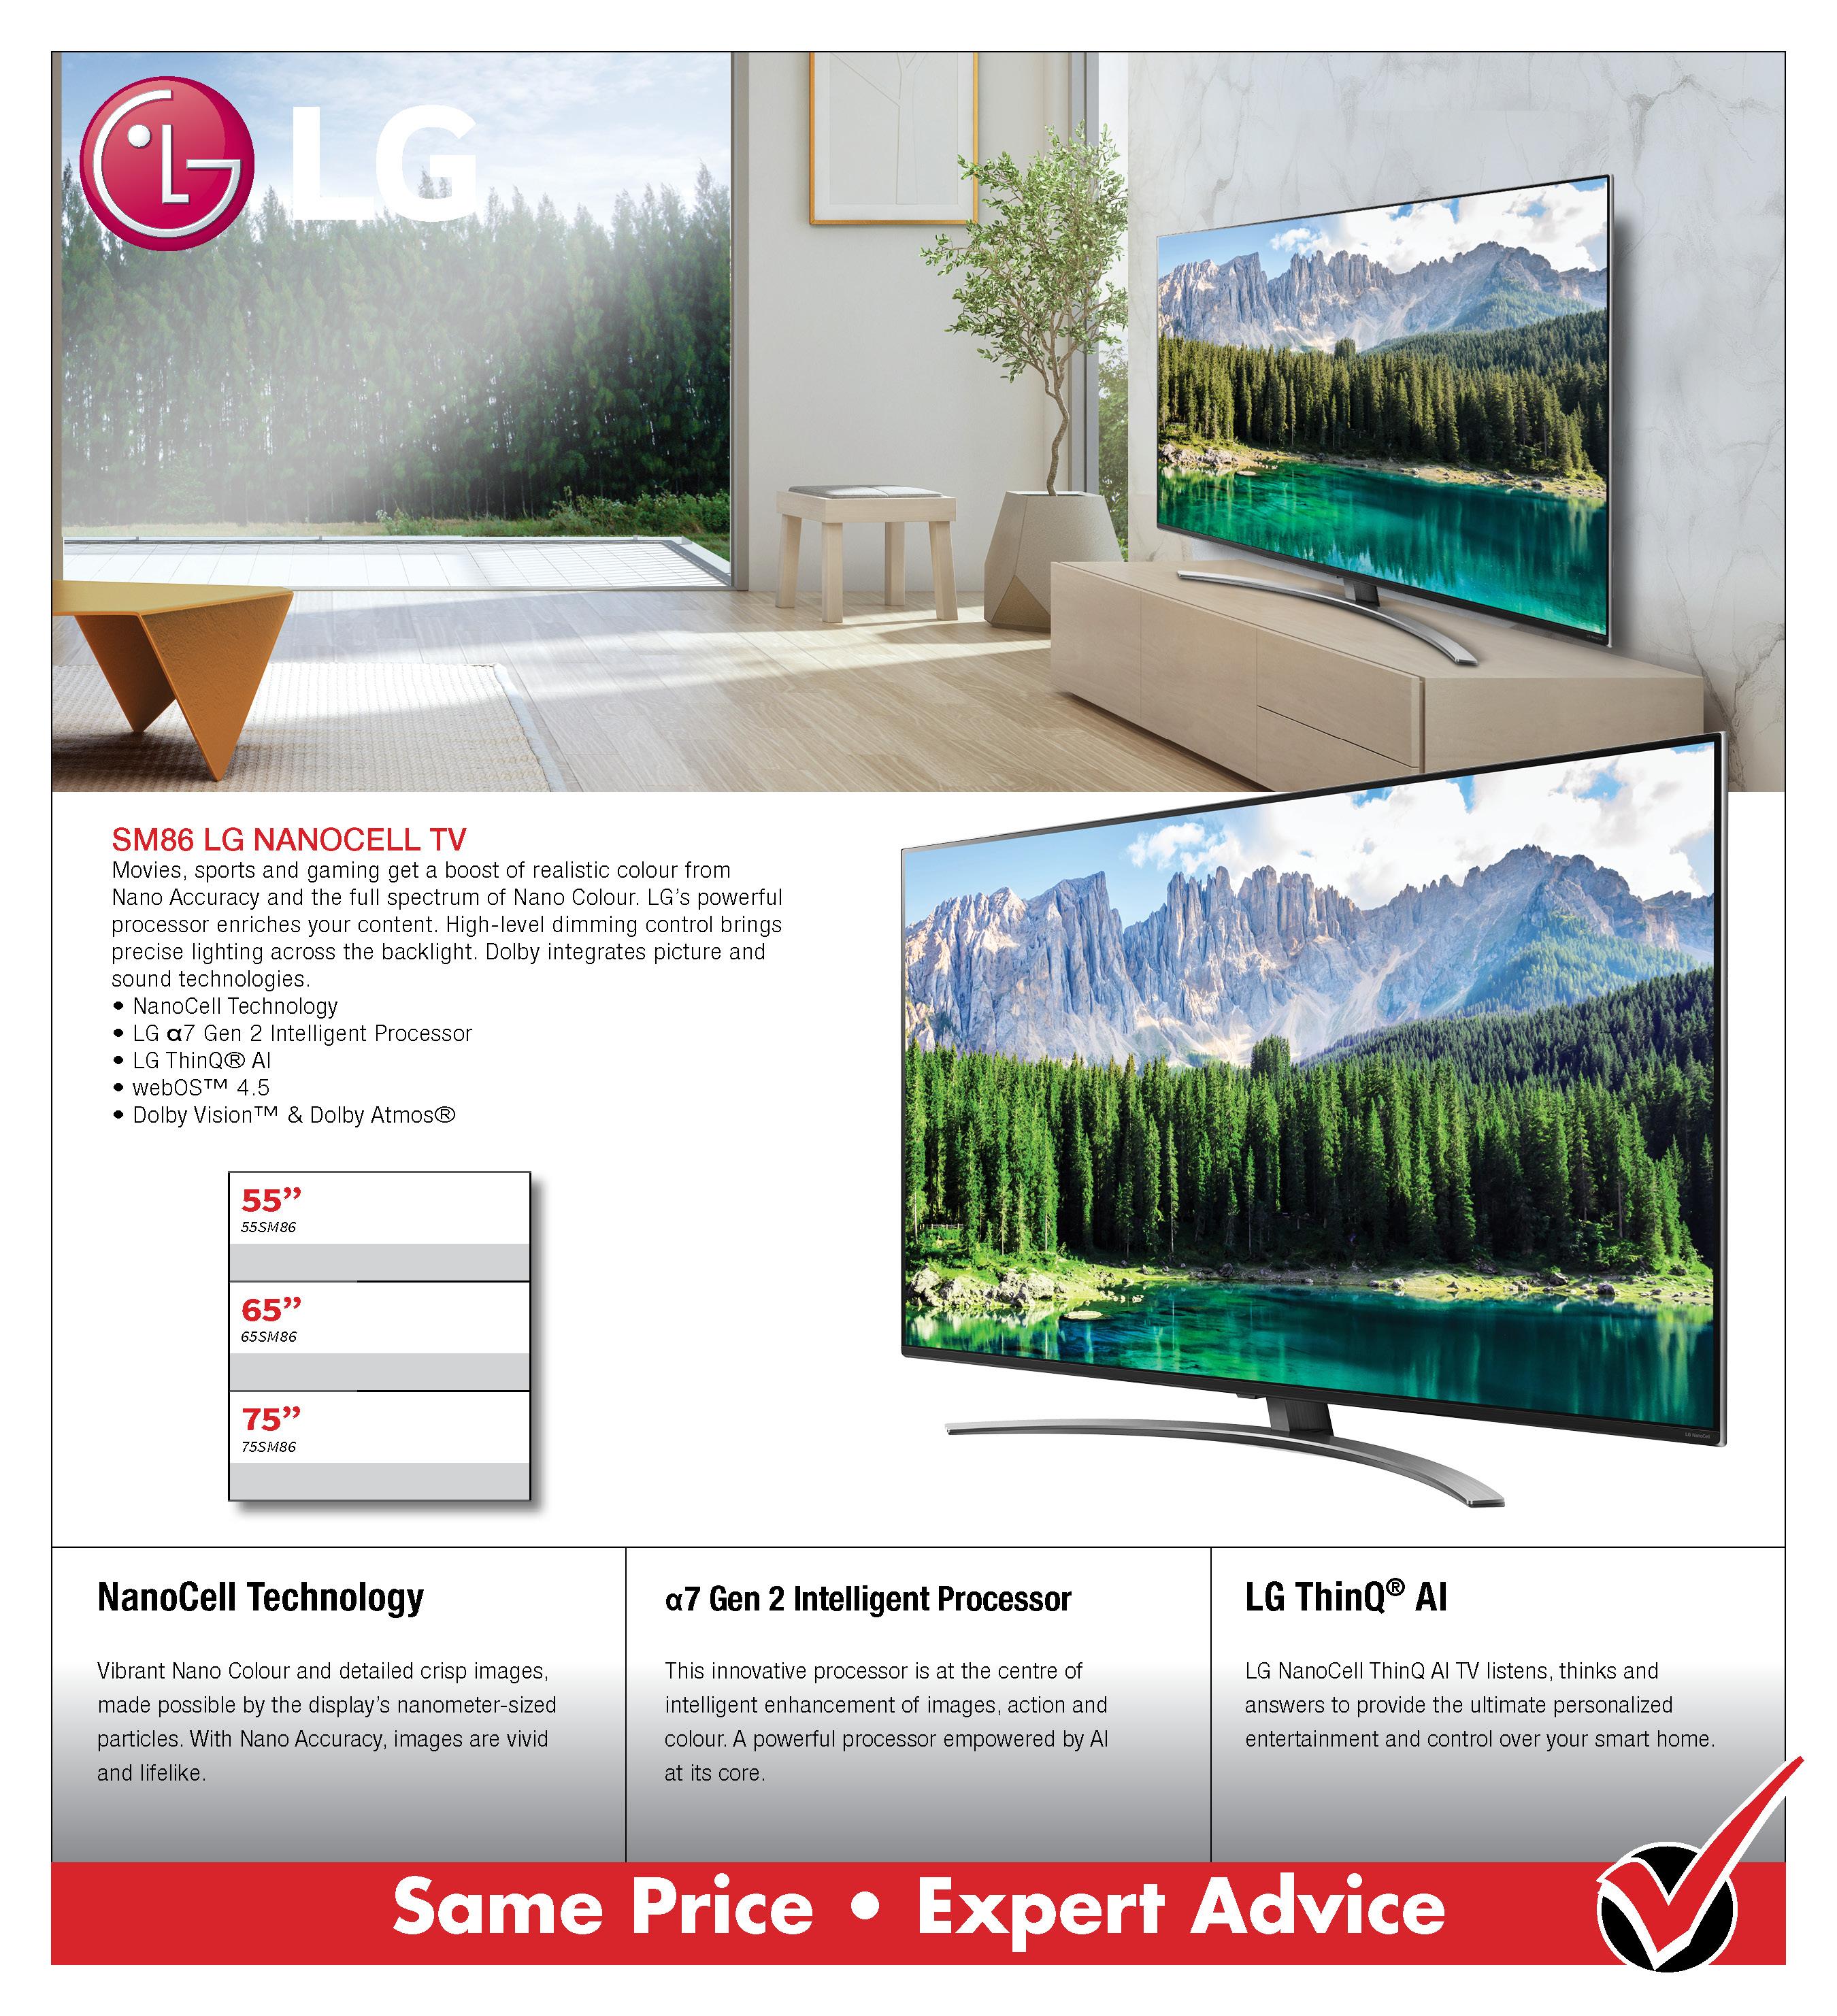 LG SM86 NanoCell TV